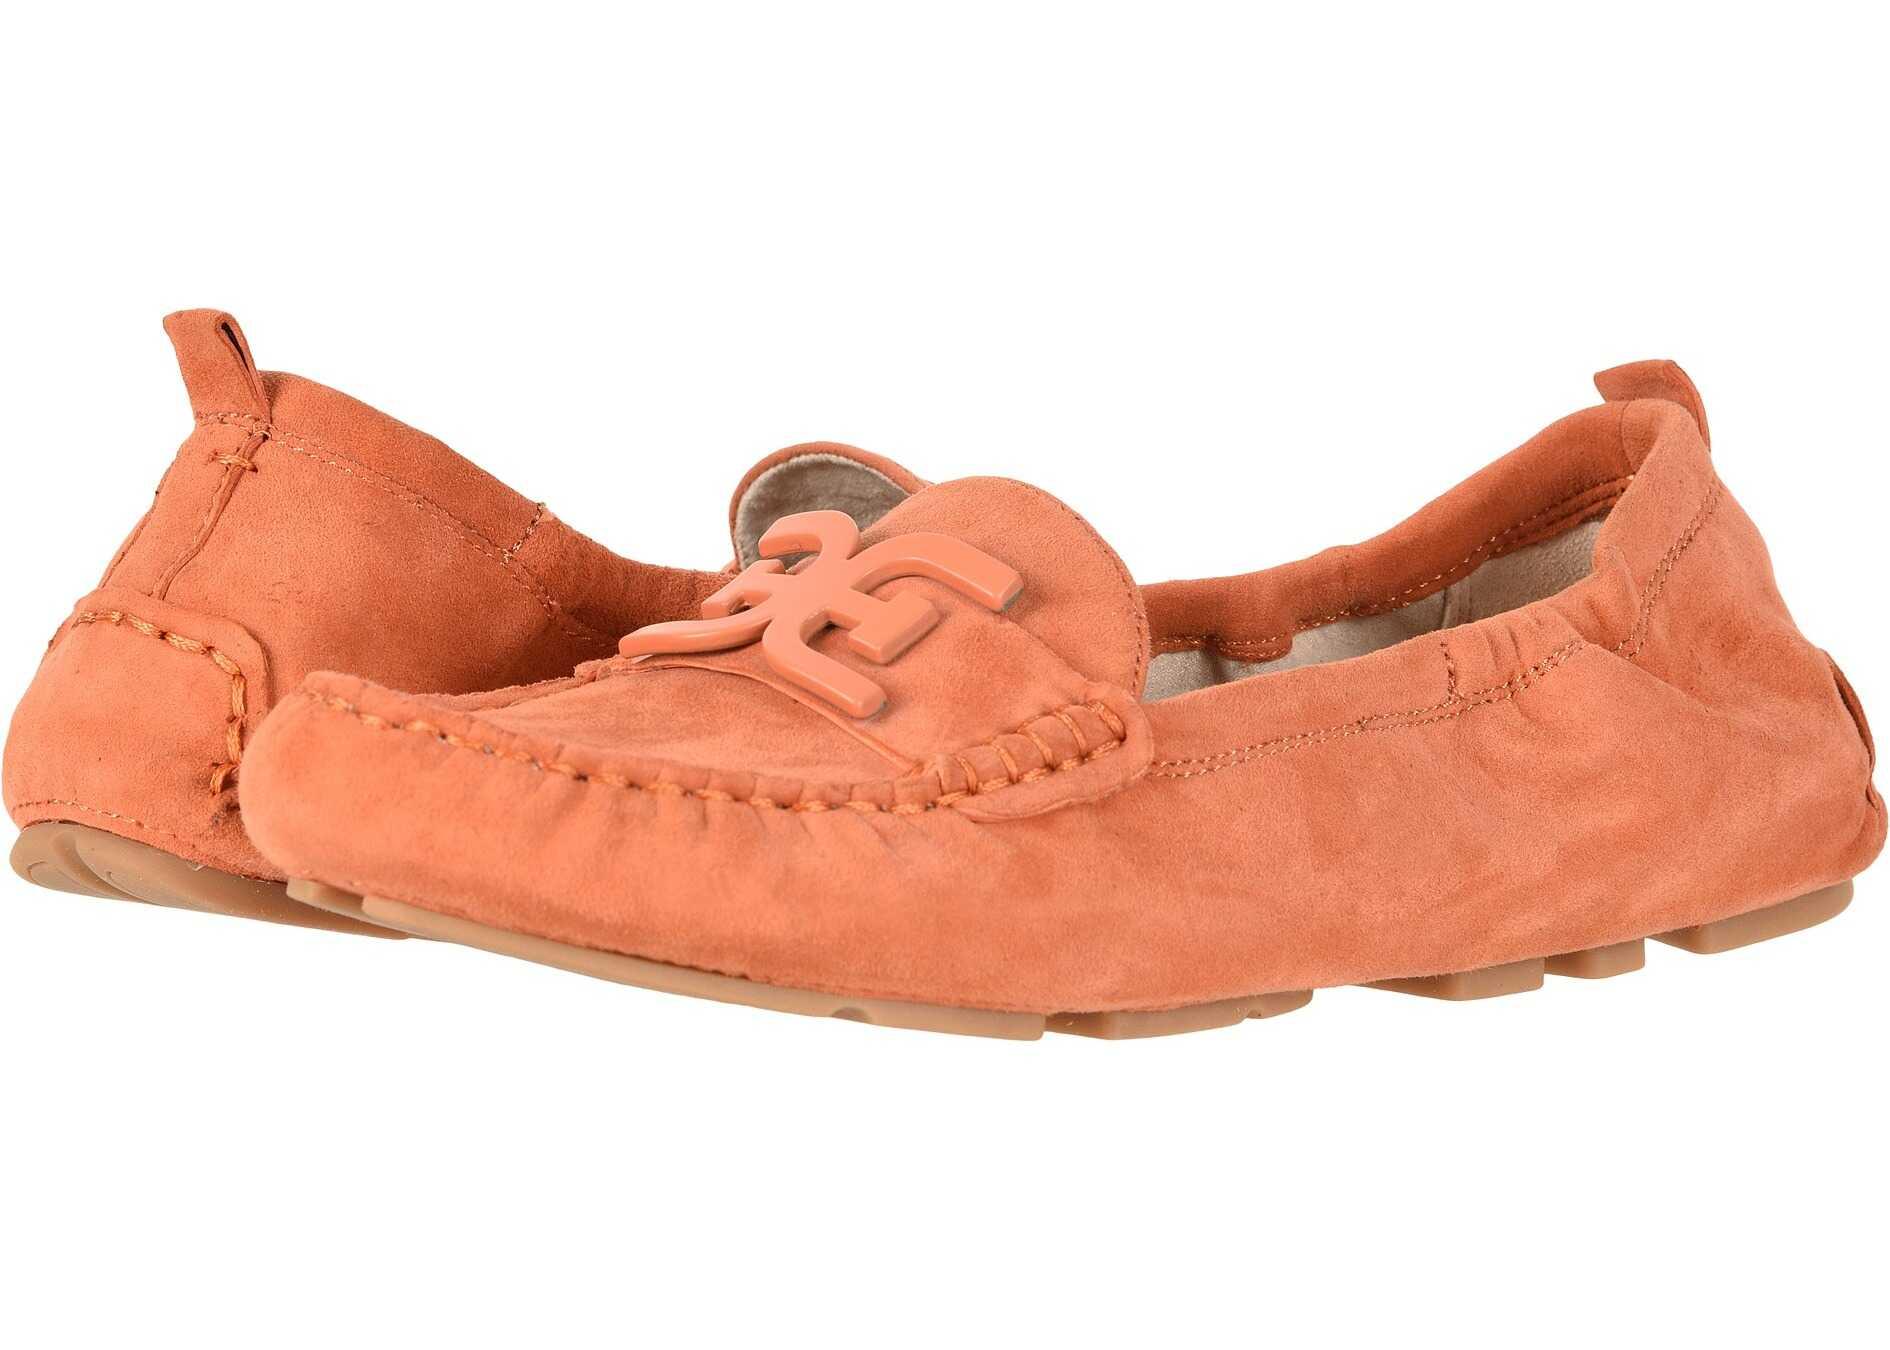 Sam Edelman Farrell Sedona Orange Kid Suede Leather